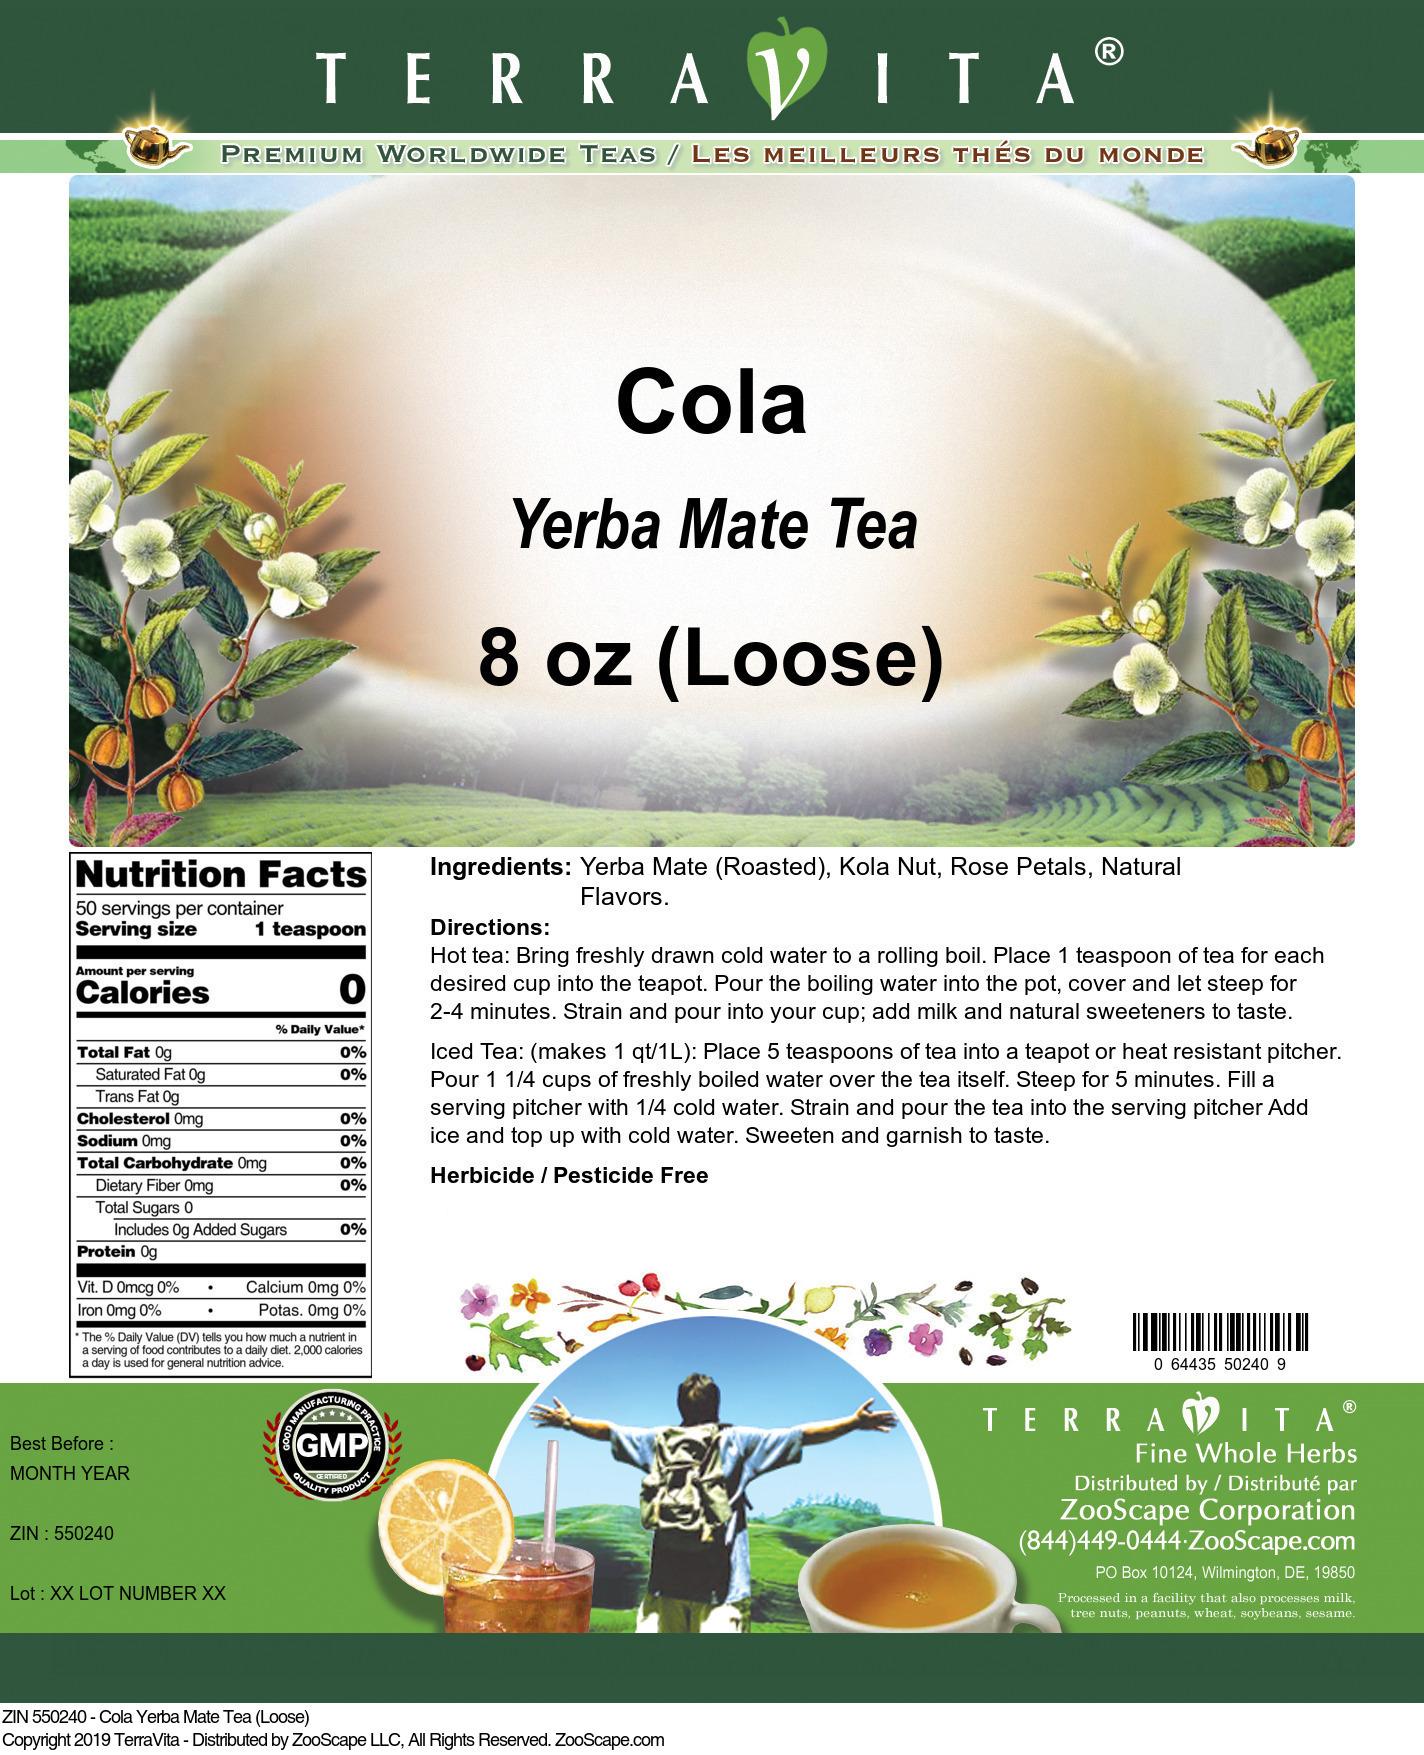 Cola Yerba Mate